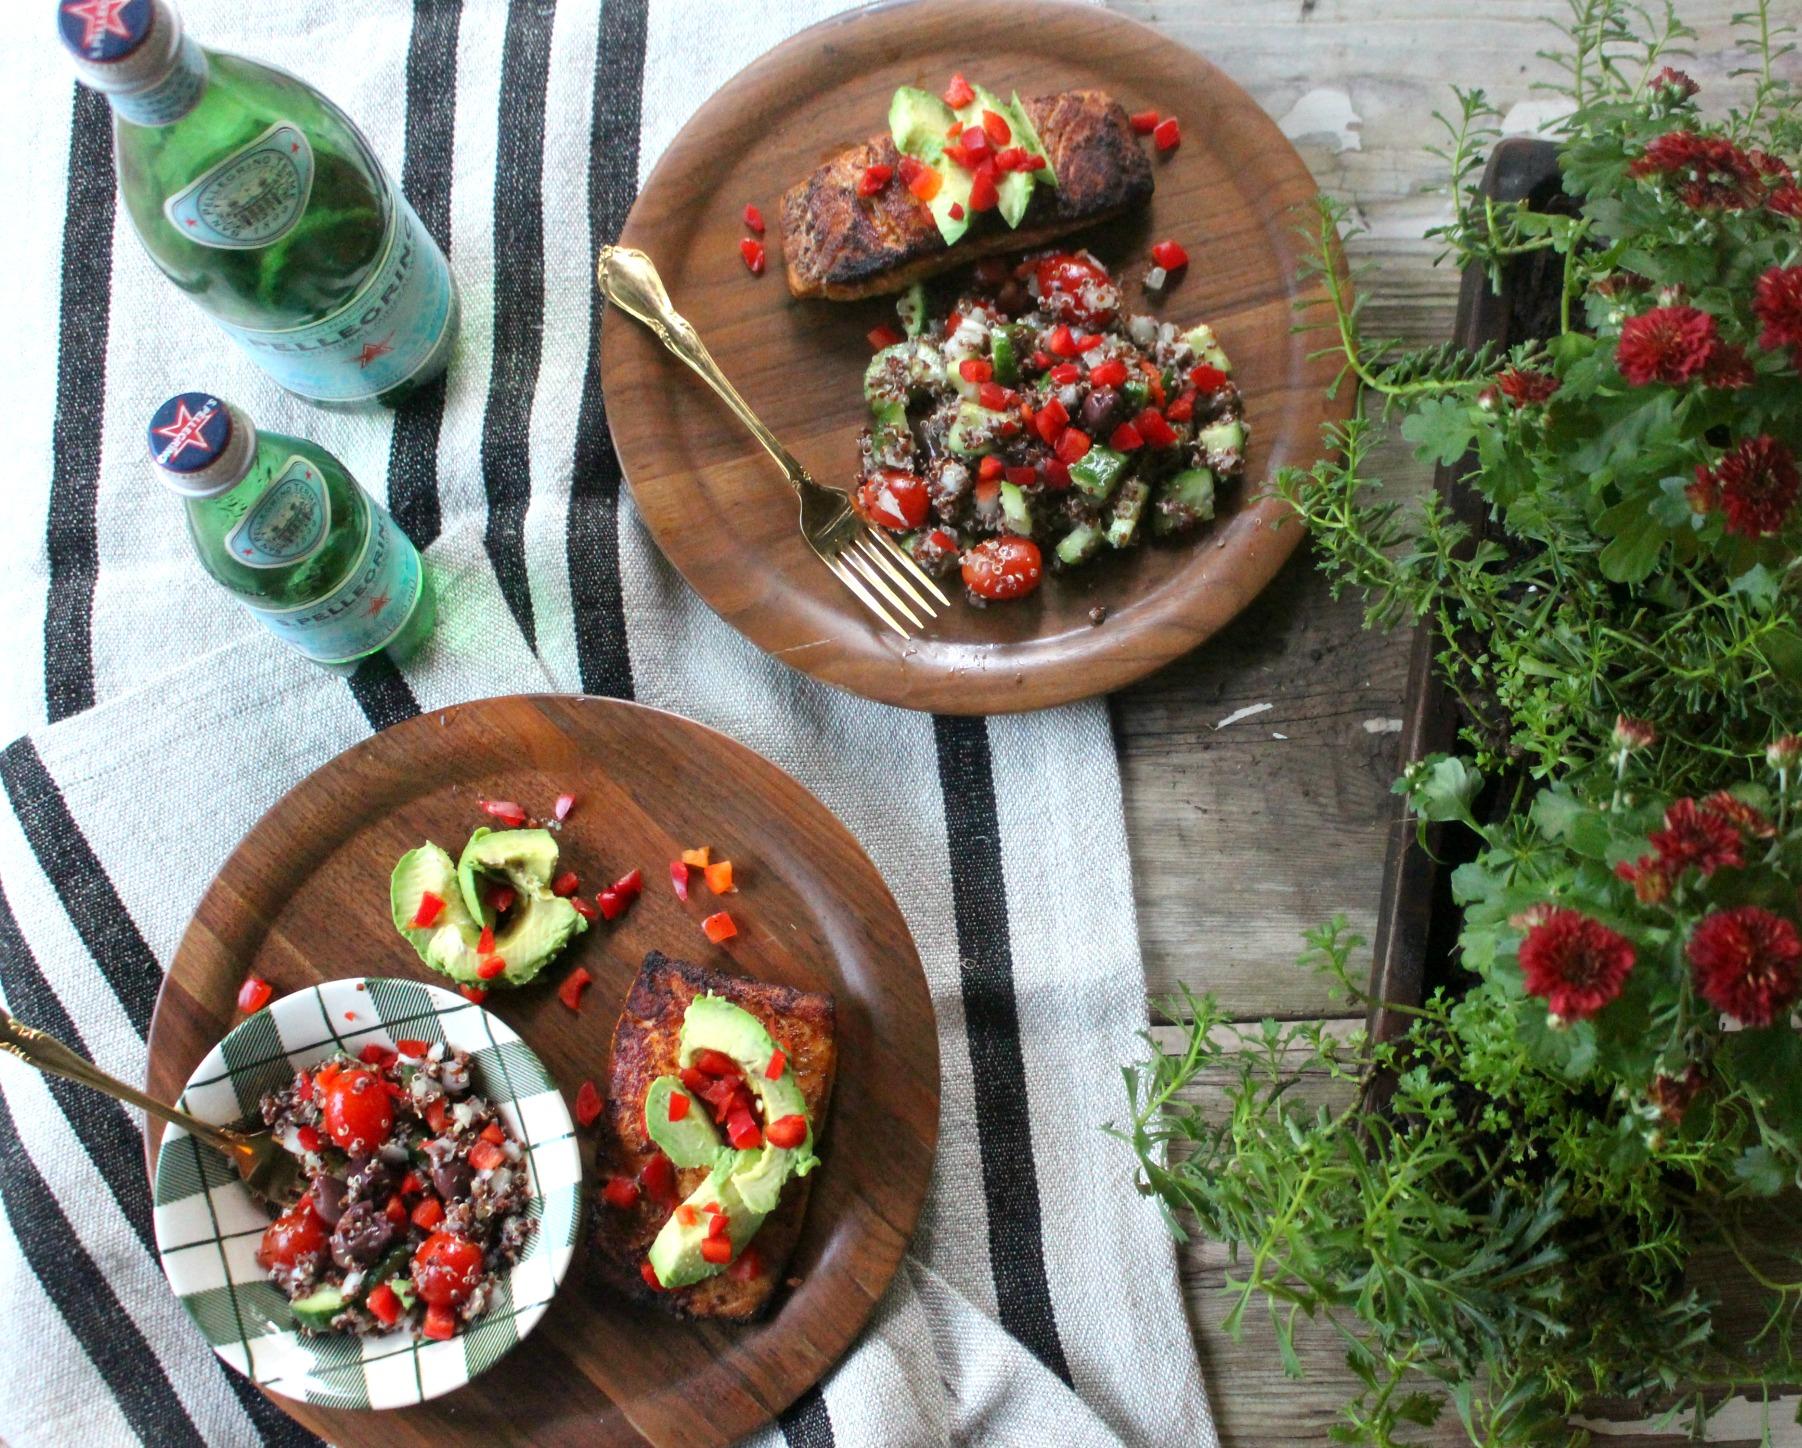 Kroger Prep + Pared Meal Kits Peruvian Salmon